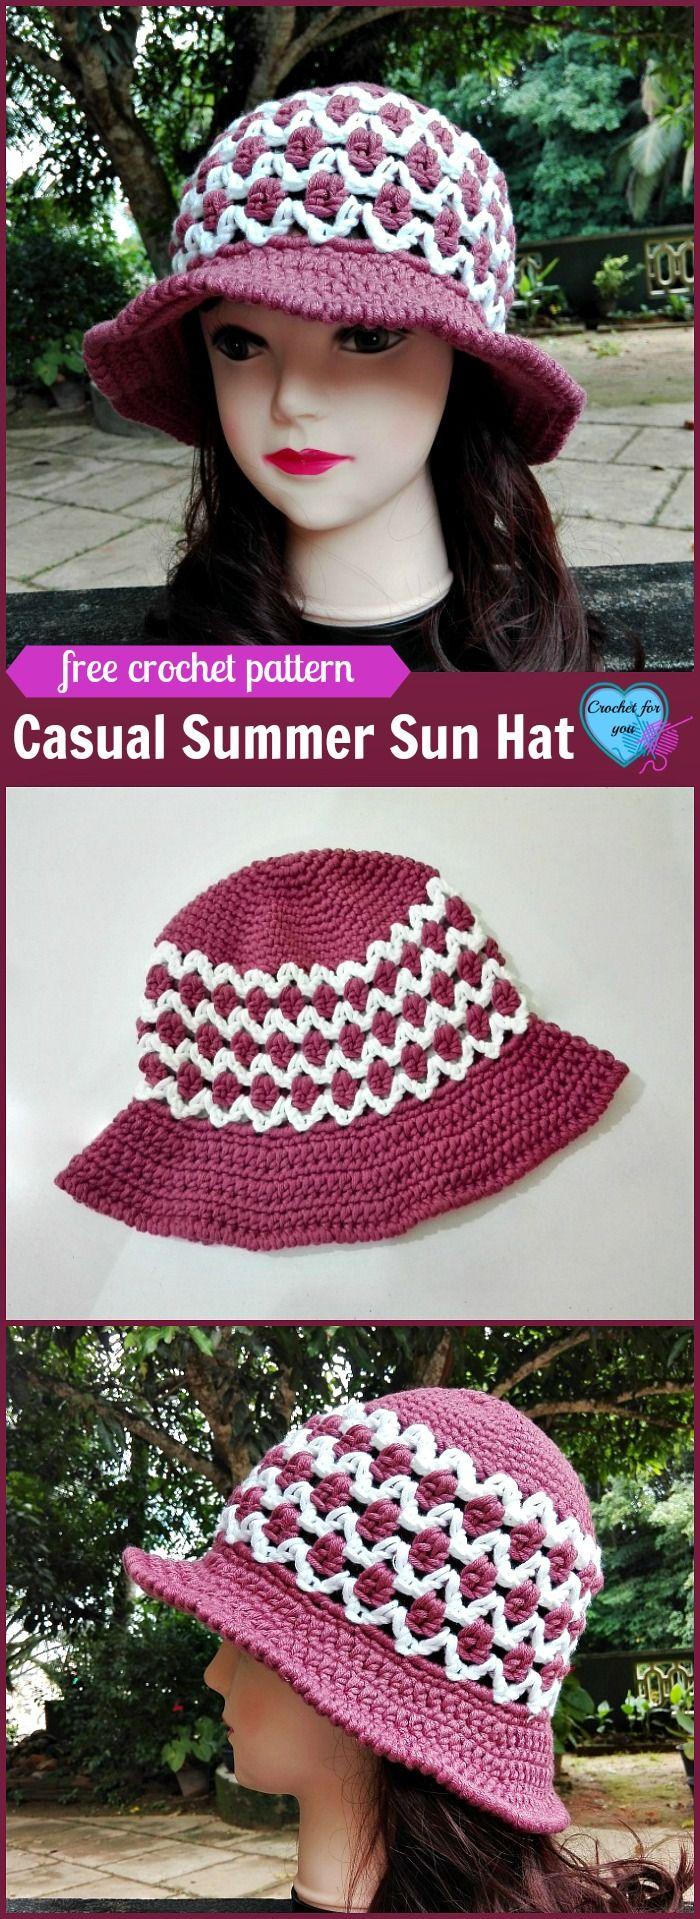 Crochet Casual Summer Sun Hat Free Pattern | Pinterest | Häkelmuster ...